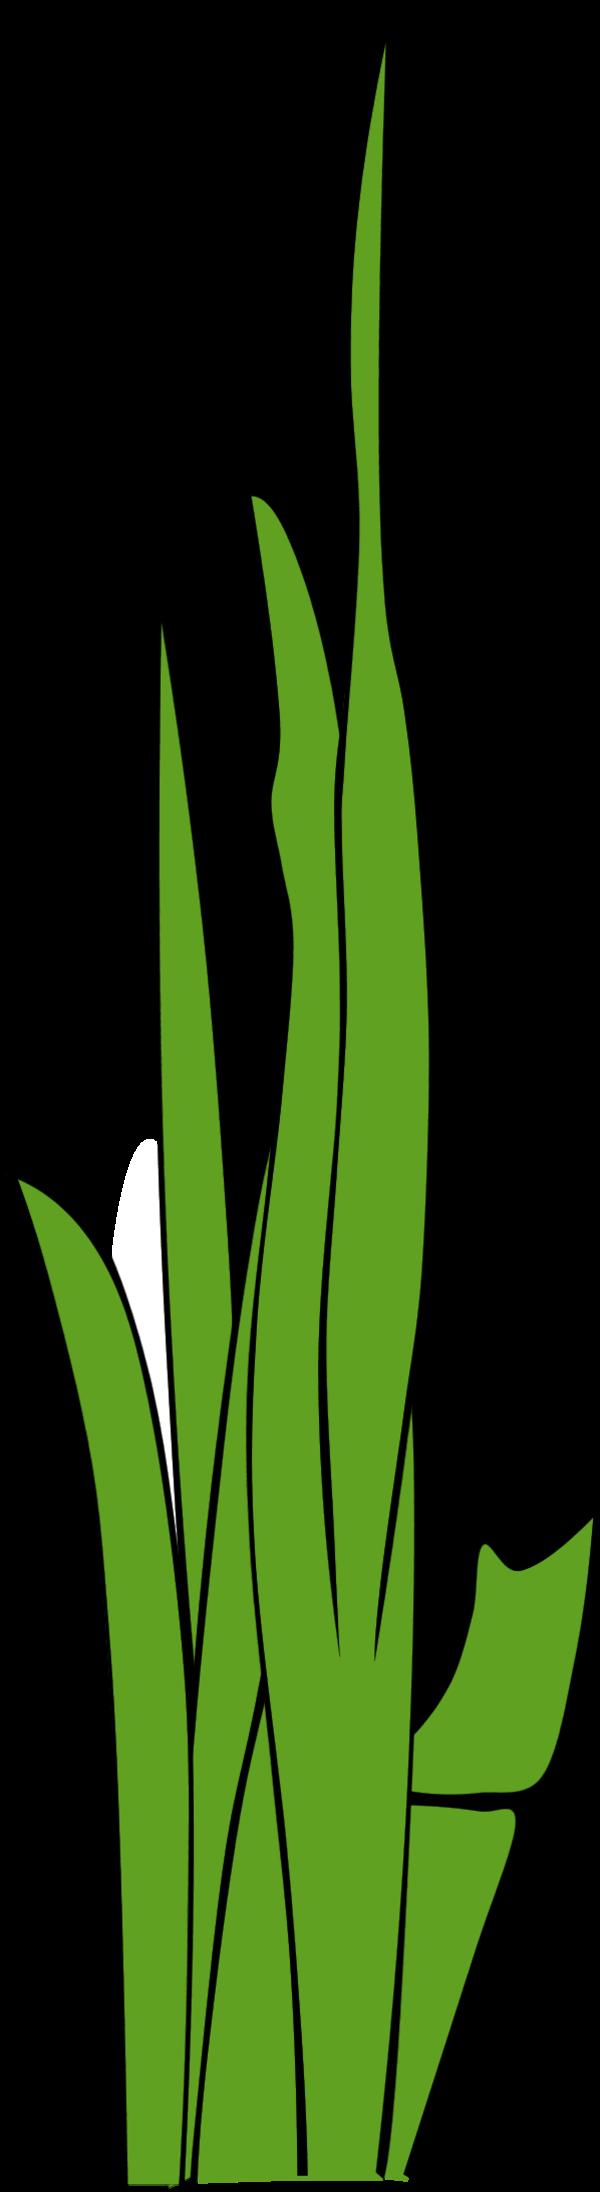 Blade Of Grass Vector.